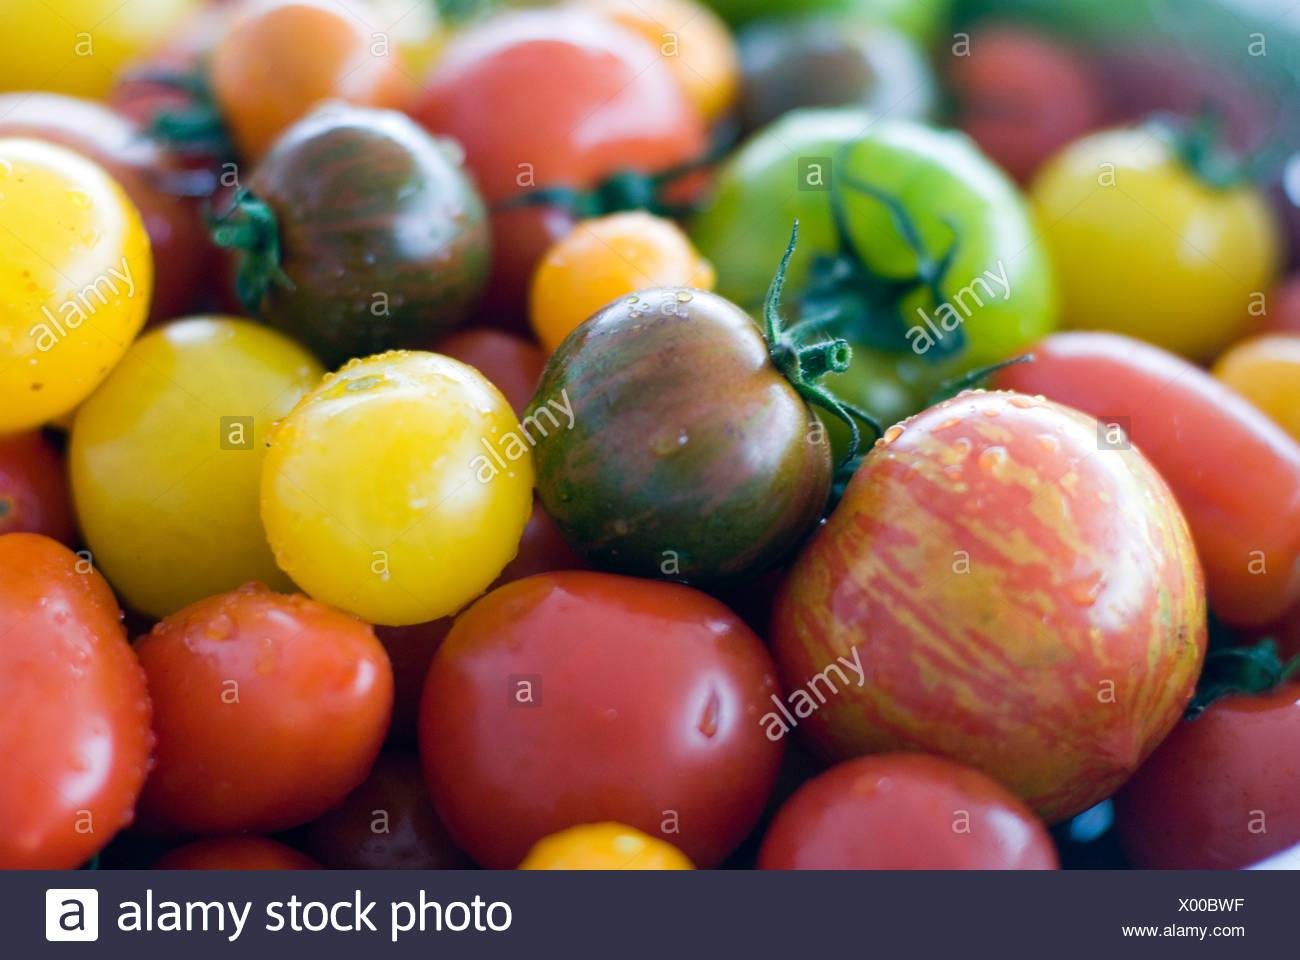 Tomato mixed varieties - Stock Image